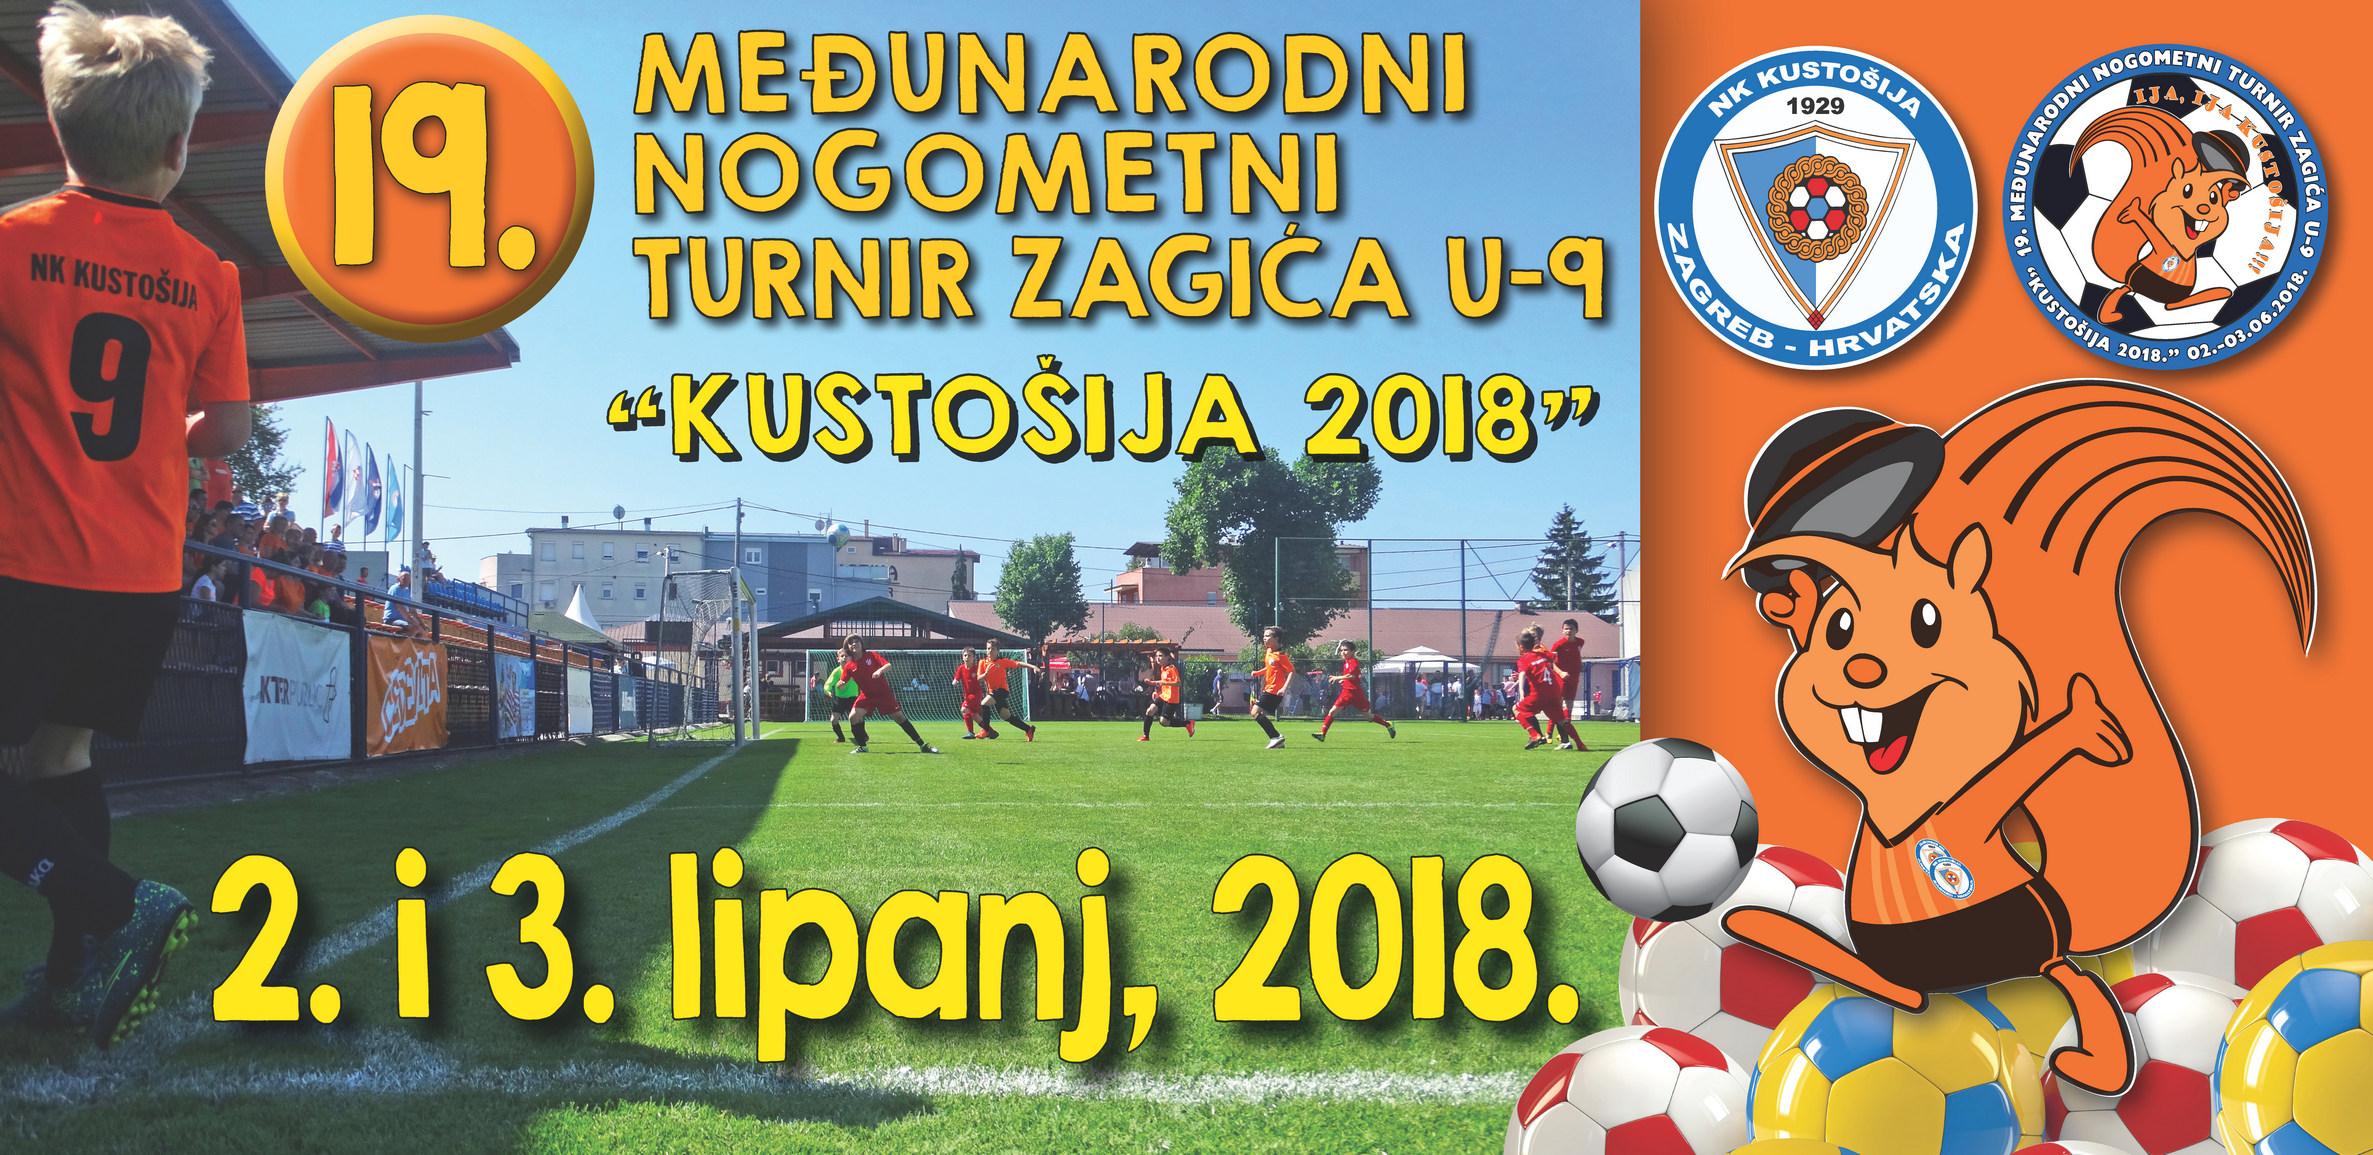 Turnir zagica 2018_plakat_w